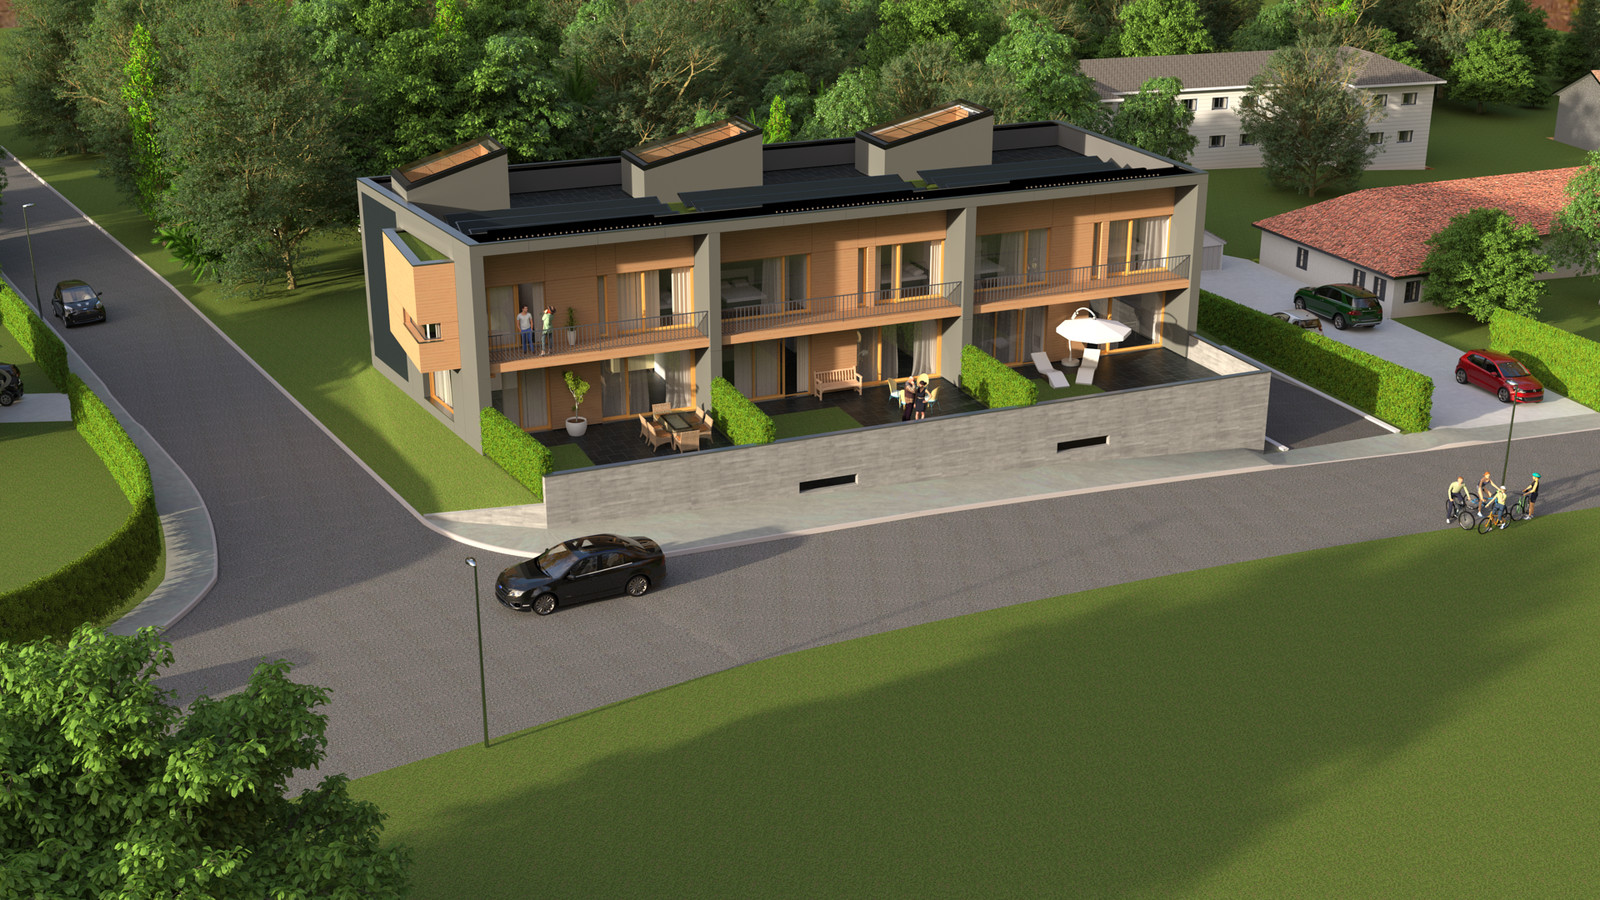 12 Exterior SW Corner Far Arial 02  KP webpage of project: http://www.kemppro.com/KP_3D_communication_3_Villas_Veyrier.html